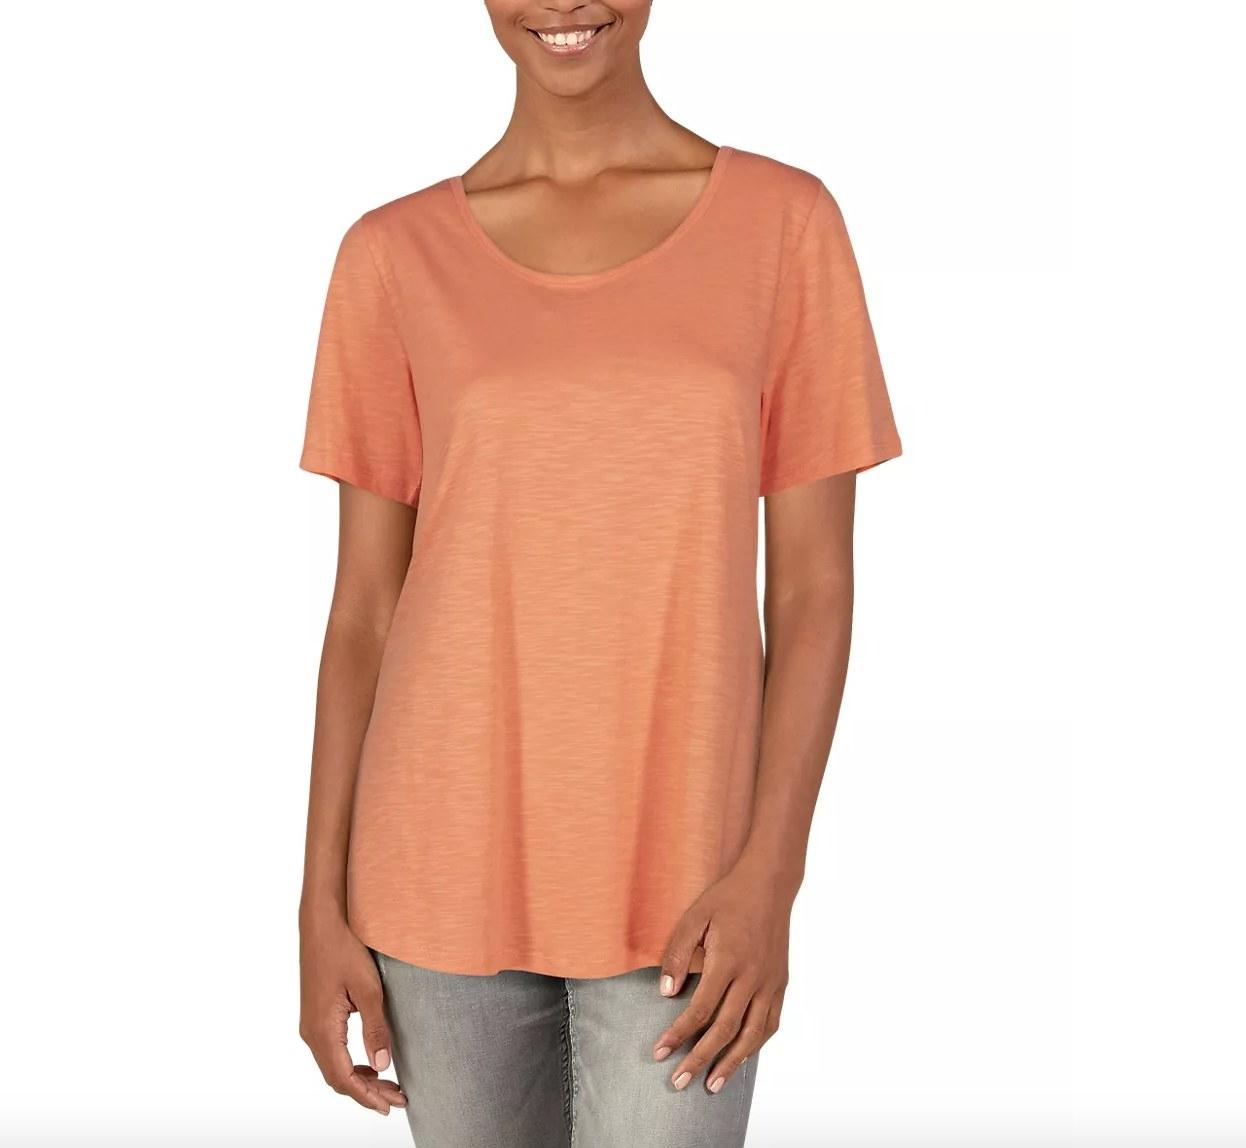 the short sleeve t-shirt in orange